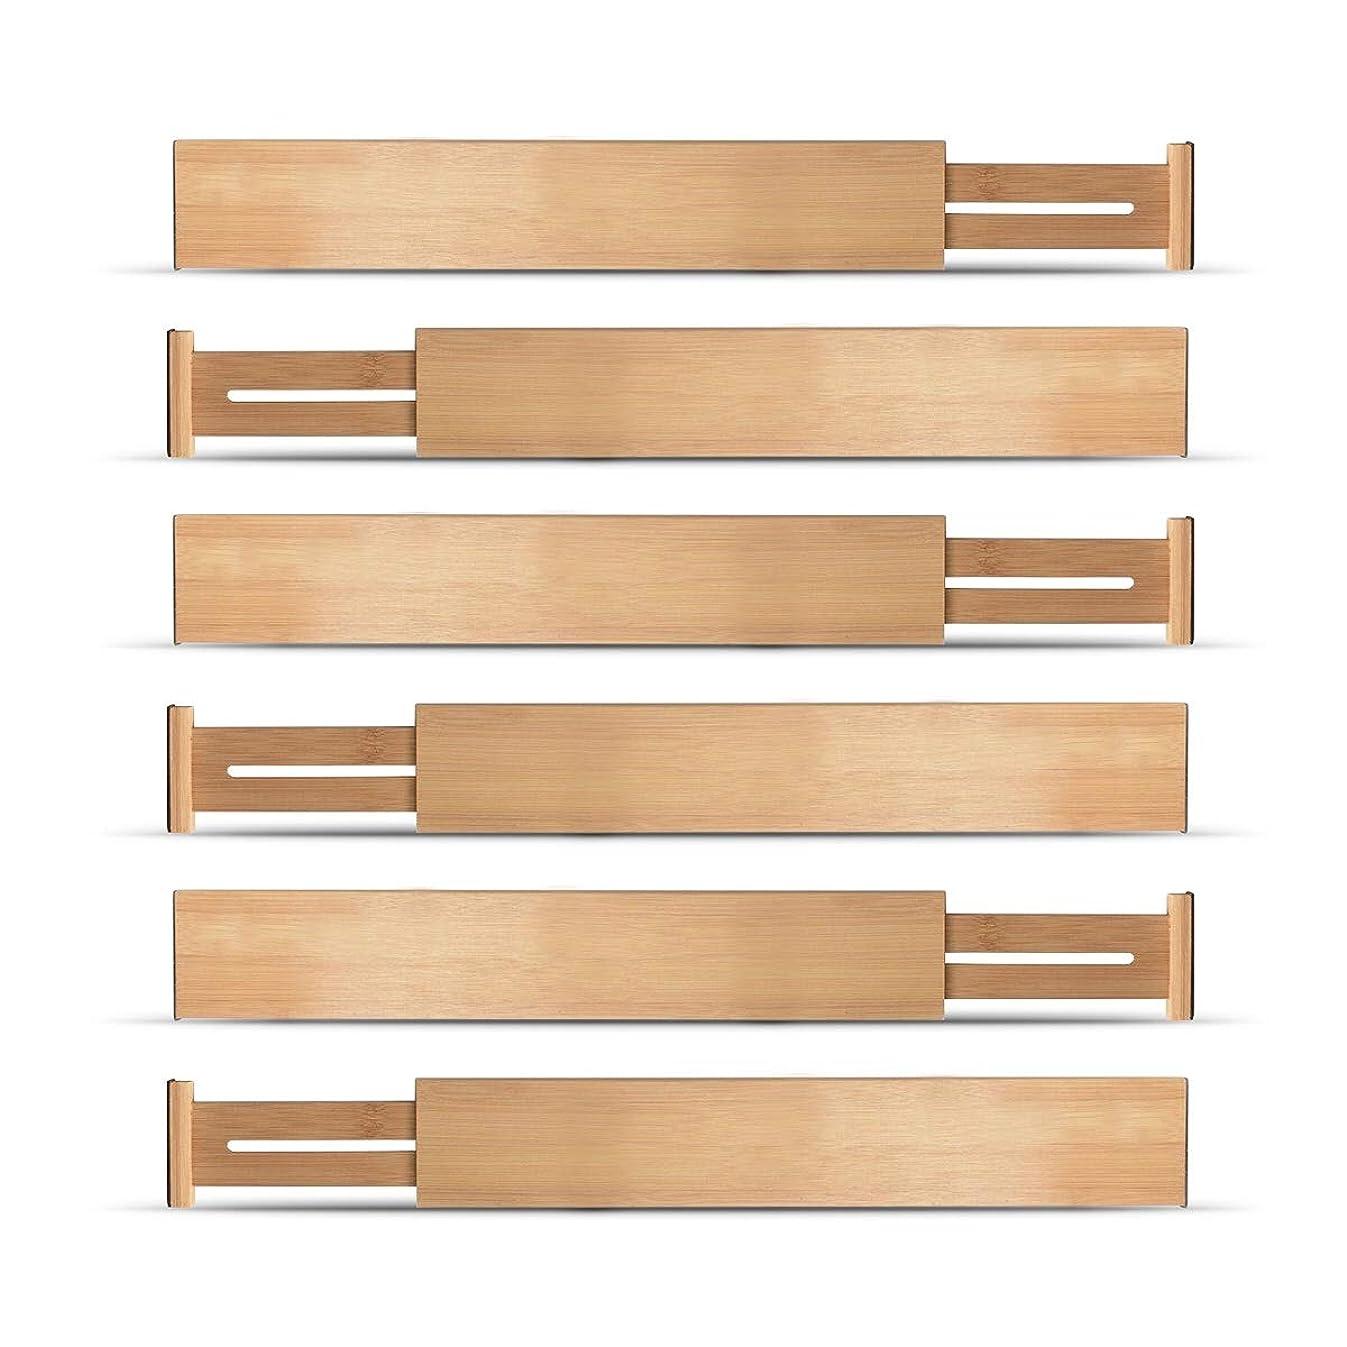 Bambusi Drawer Dividers Organizers Set - Spring Loaded Adjustable Bamboo Drawer Separators for Home & Office Organization (Set of 6)